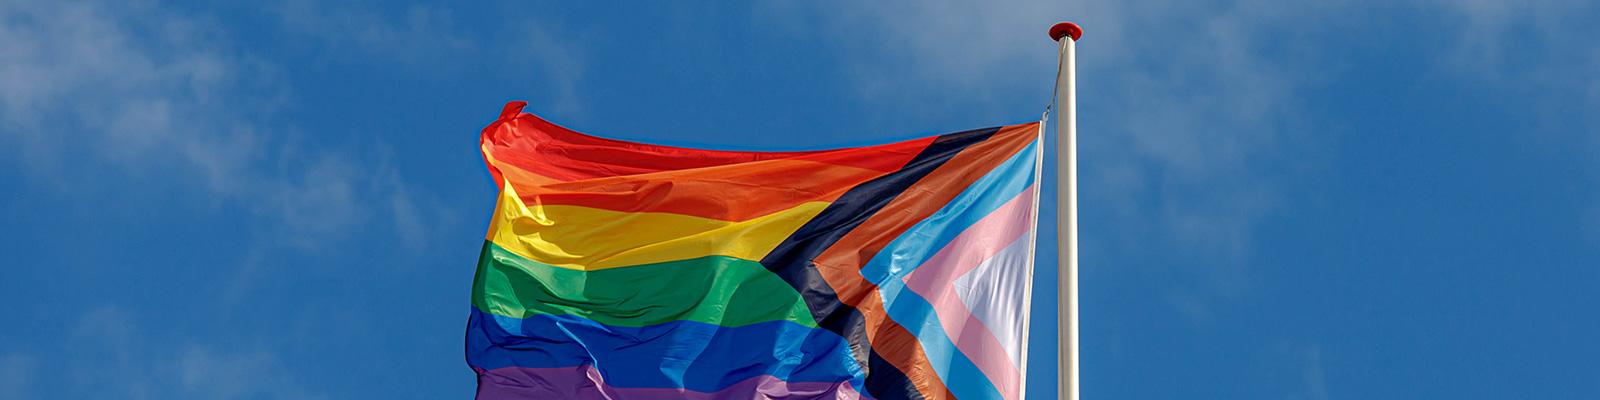 Marketers guide to a successful pride campaign